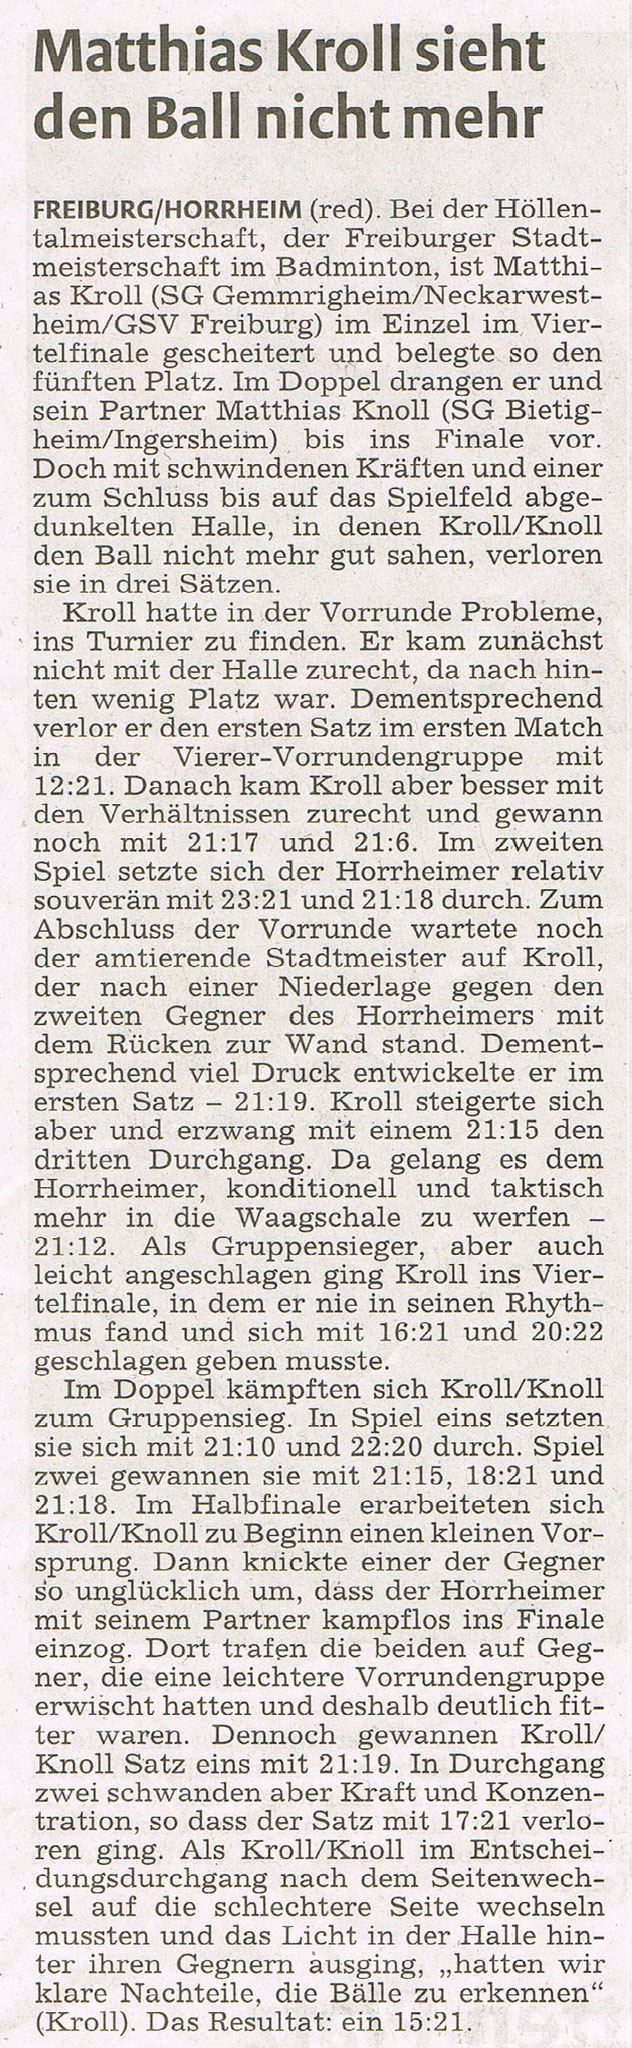 Bericht vkz zur Höllentalmeisterschaft